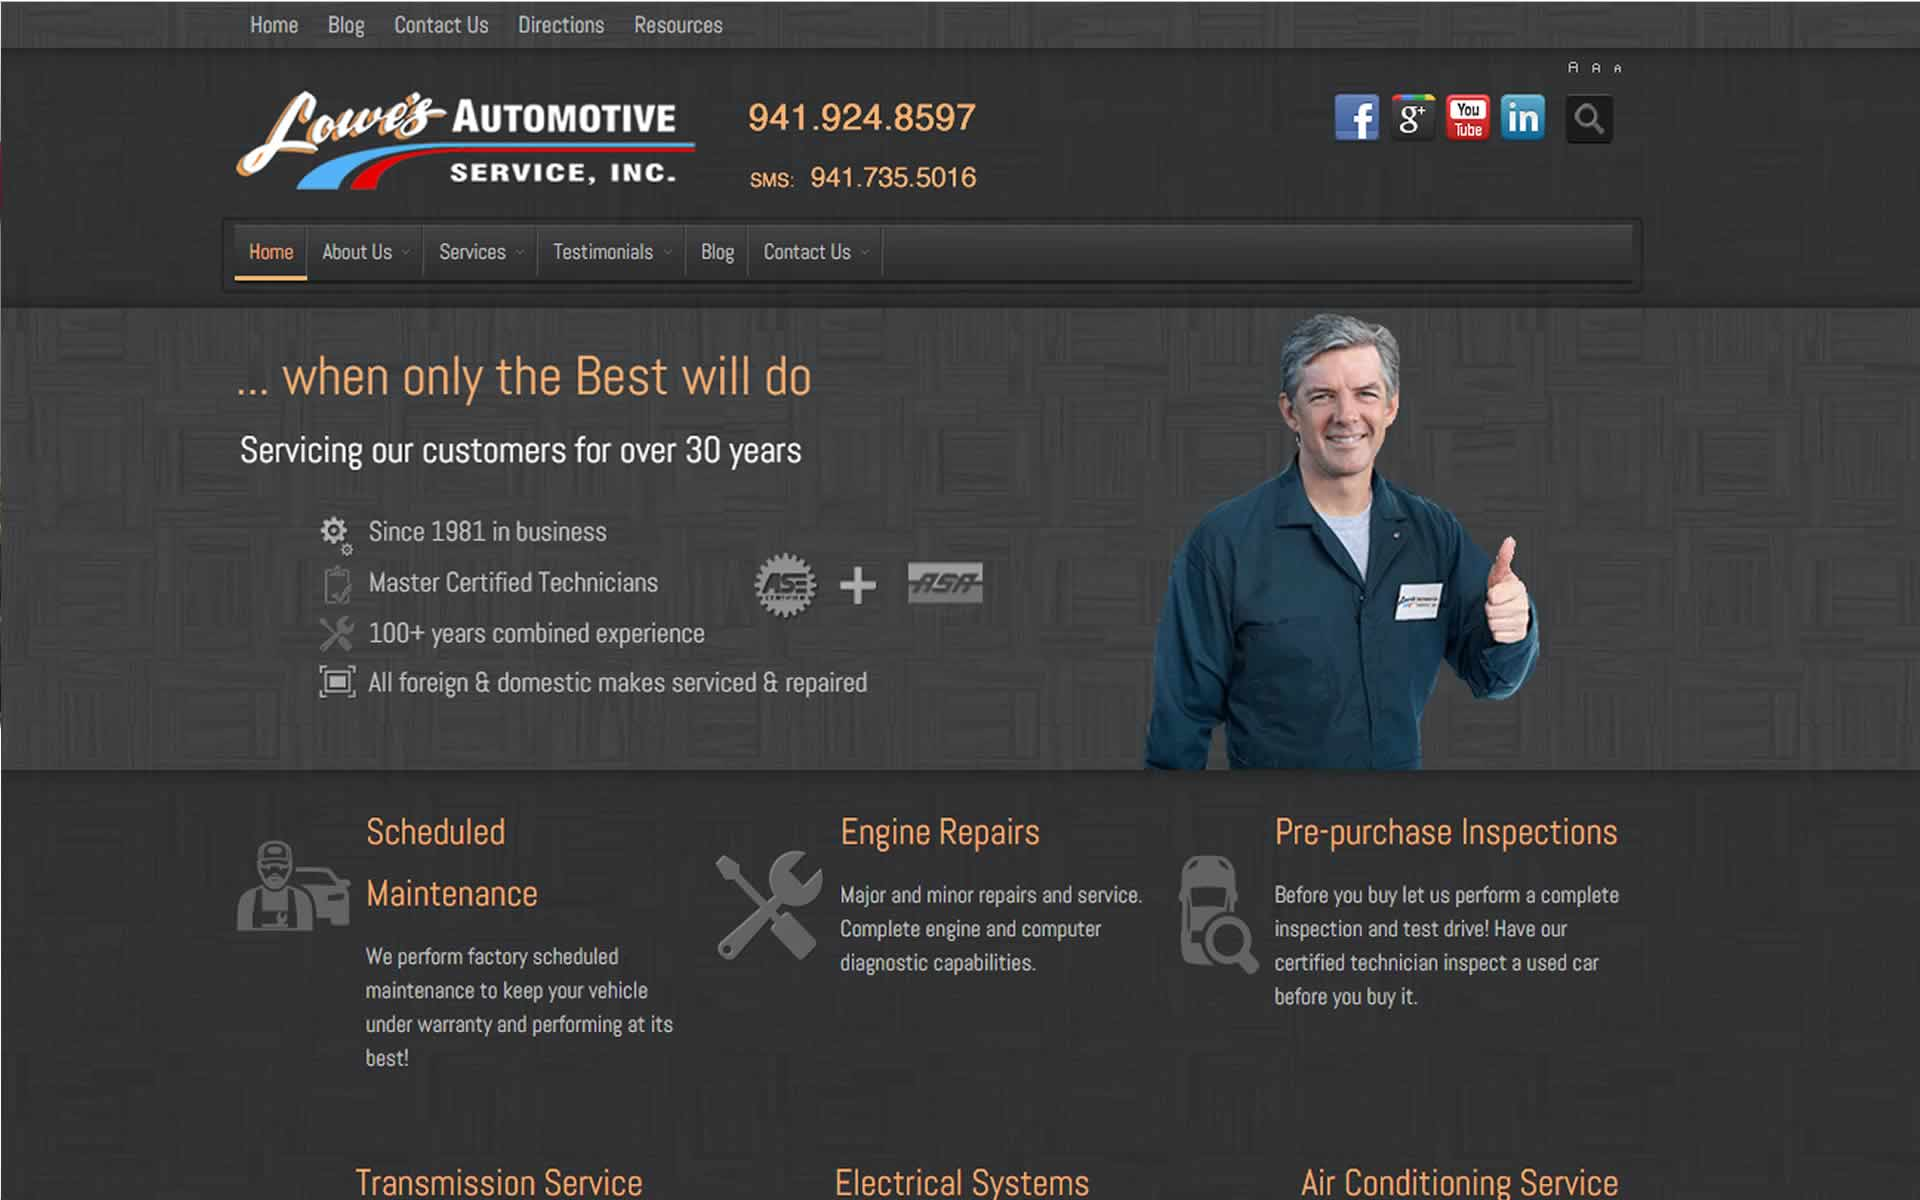 Lowe's Automotive Service